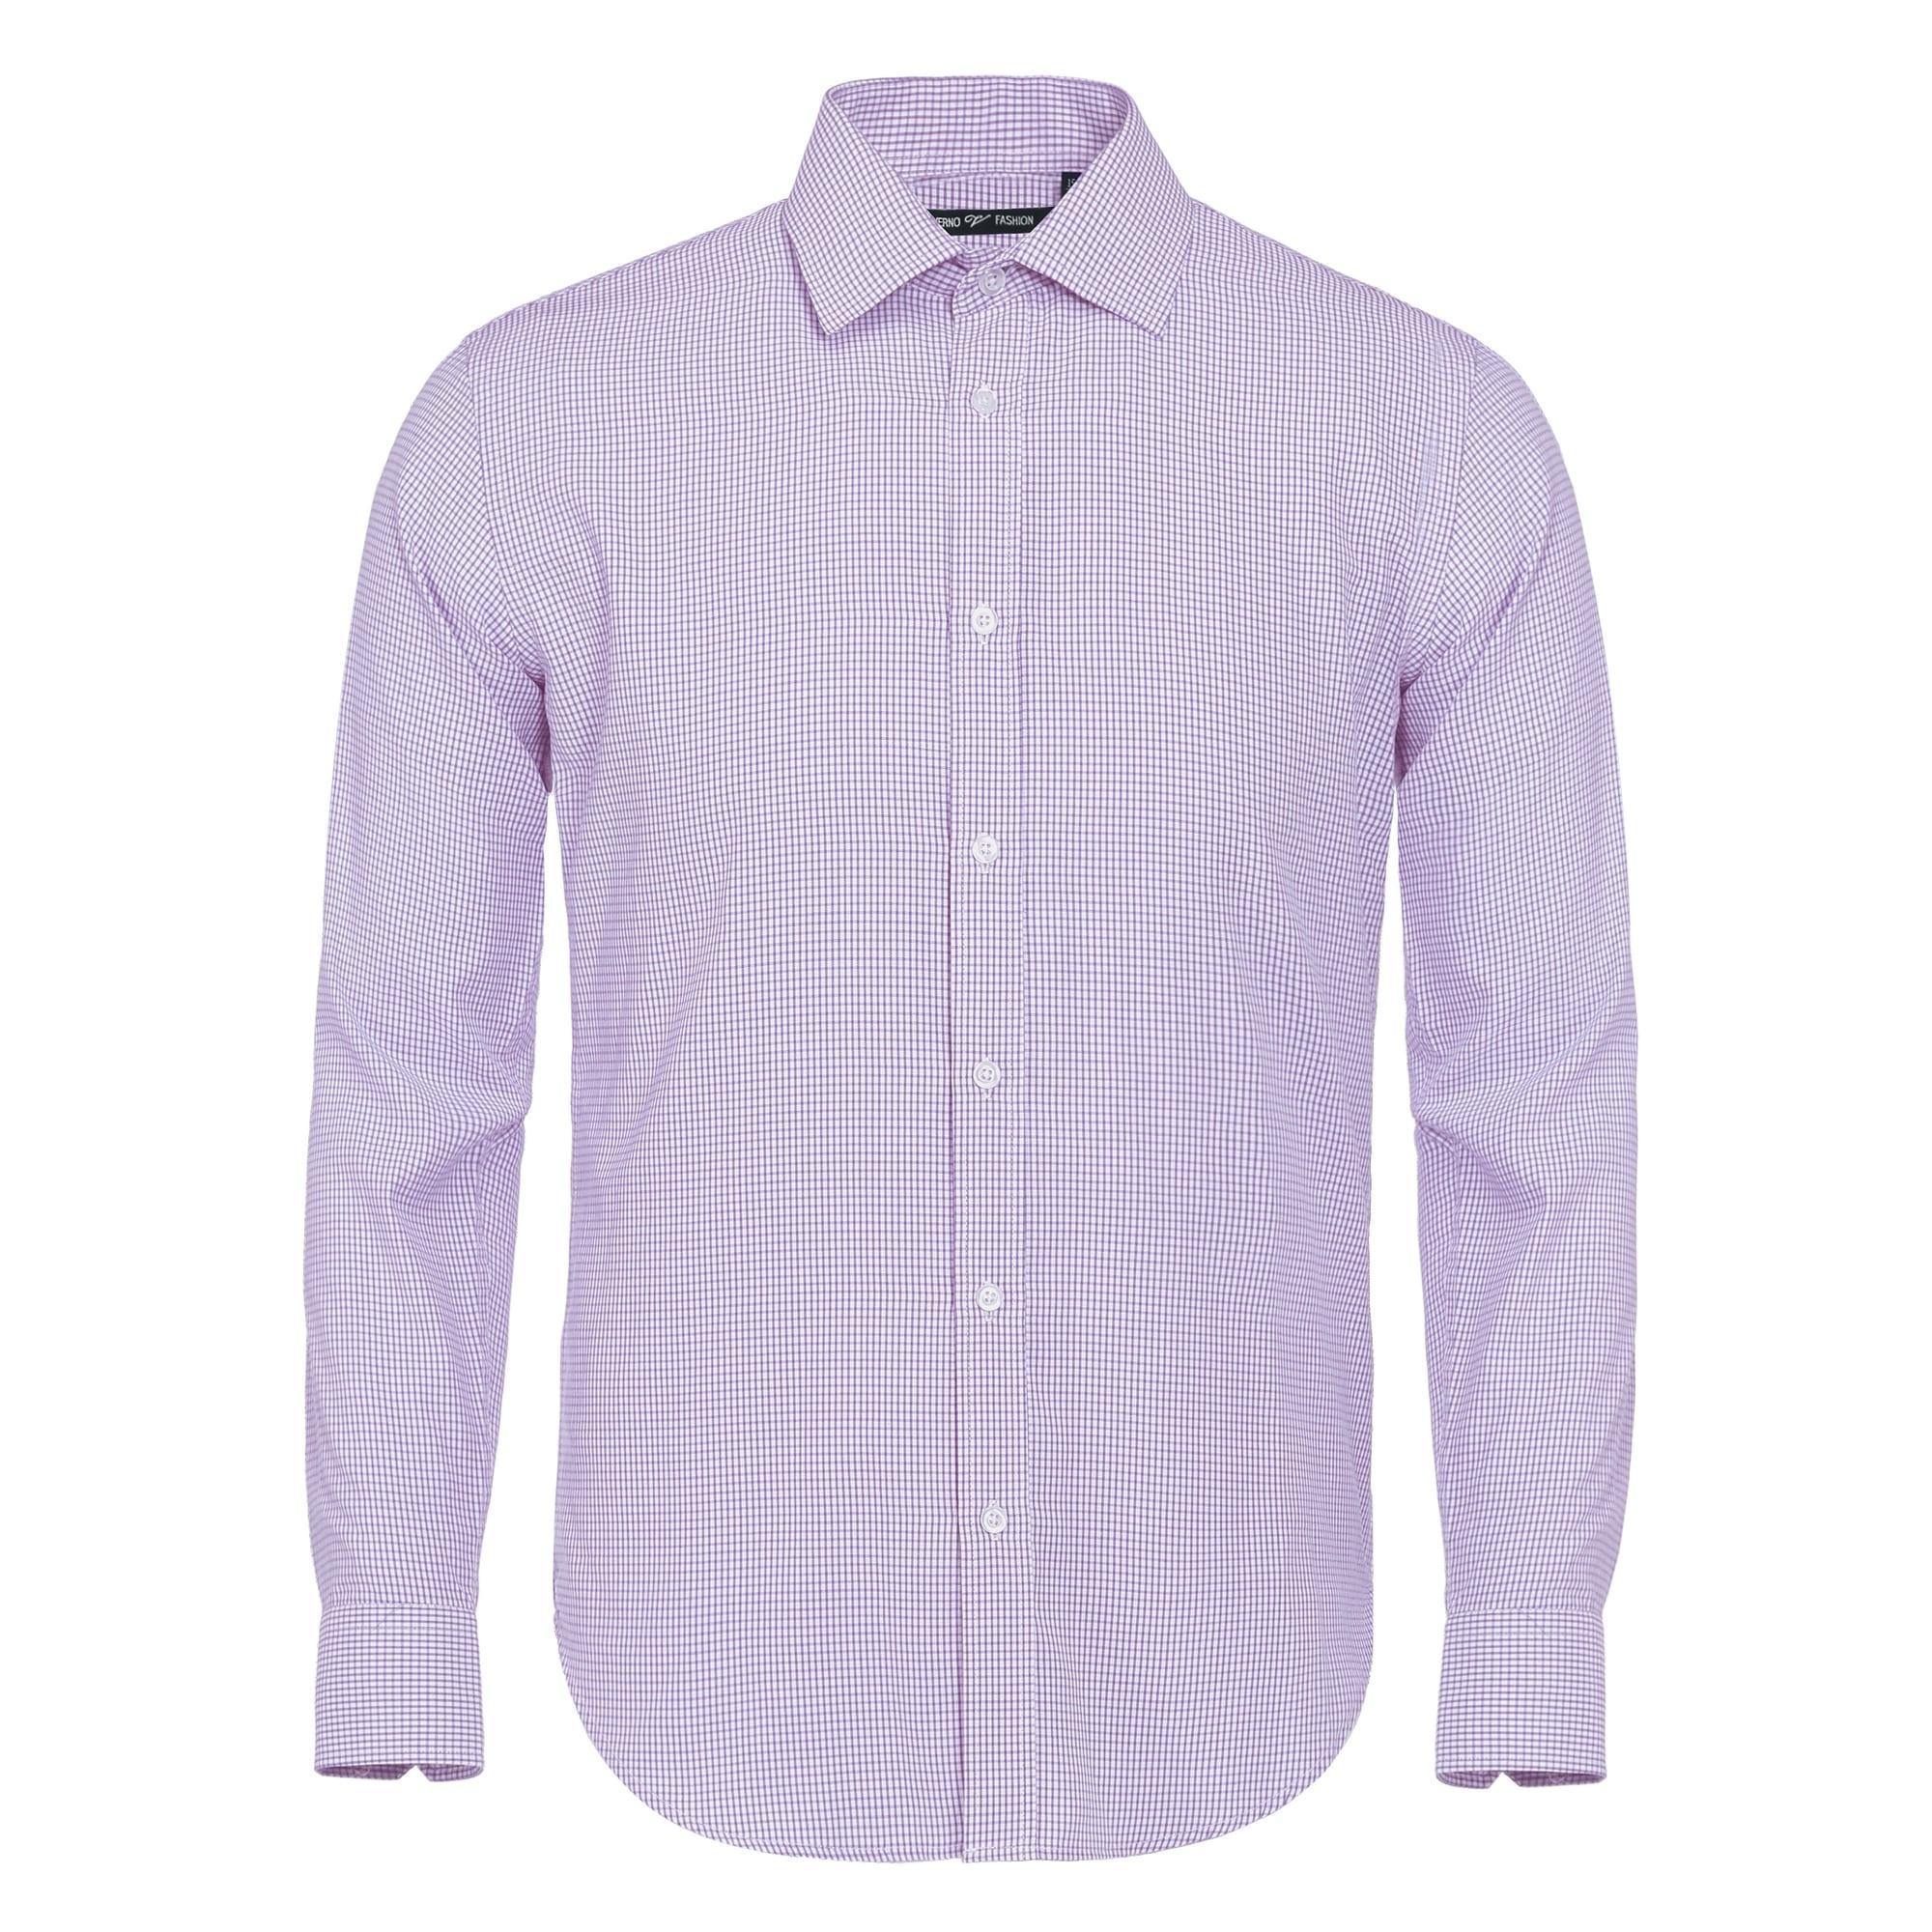 Size 17 36//37 White Ryan Seacrest Men/'s Slim Fit Textured French Dress Shirt